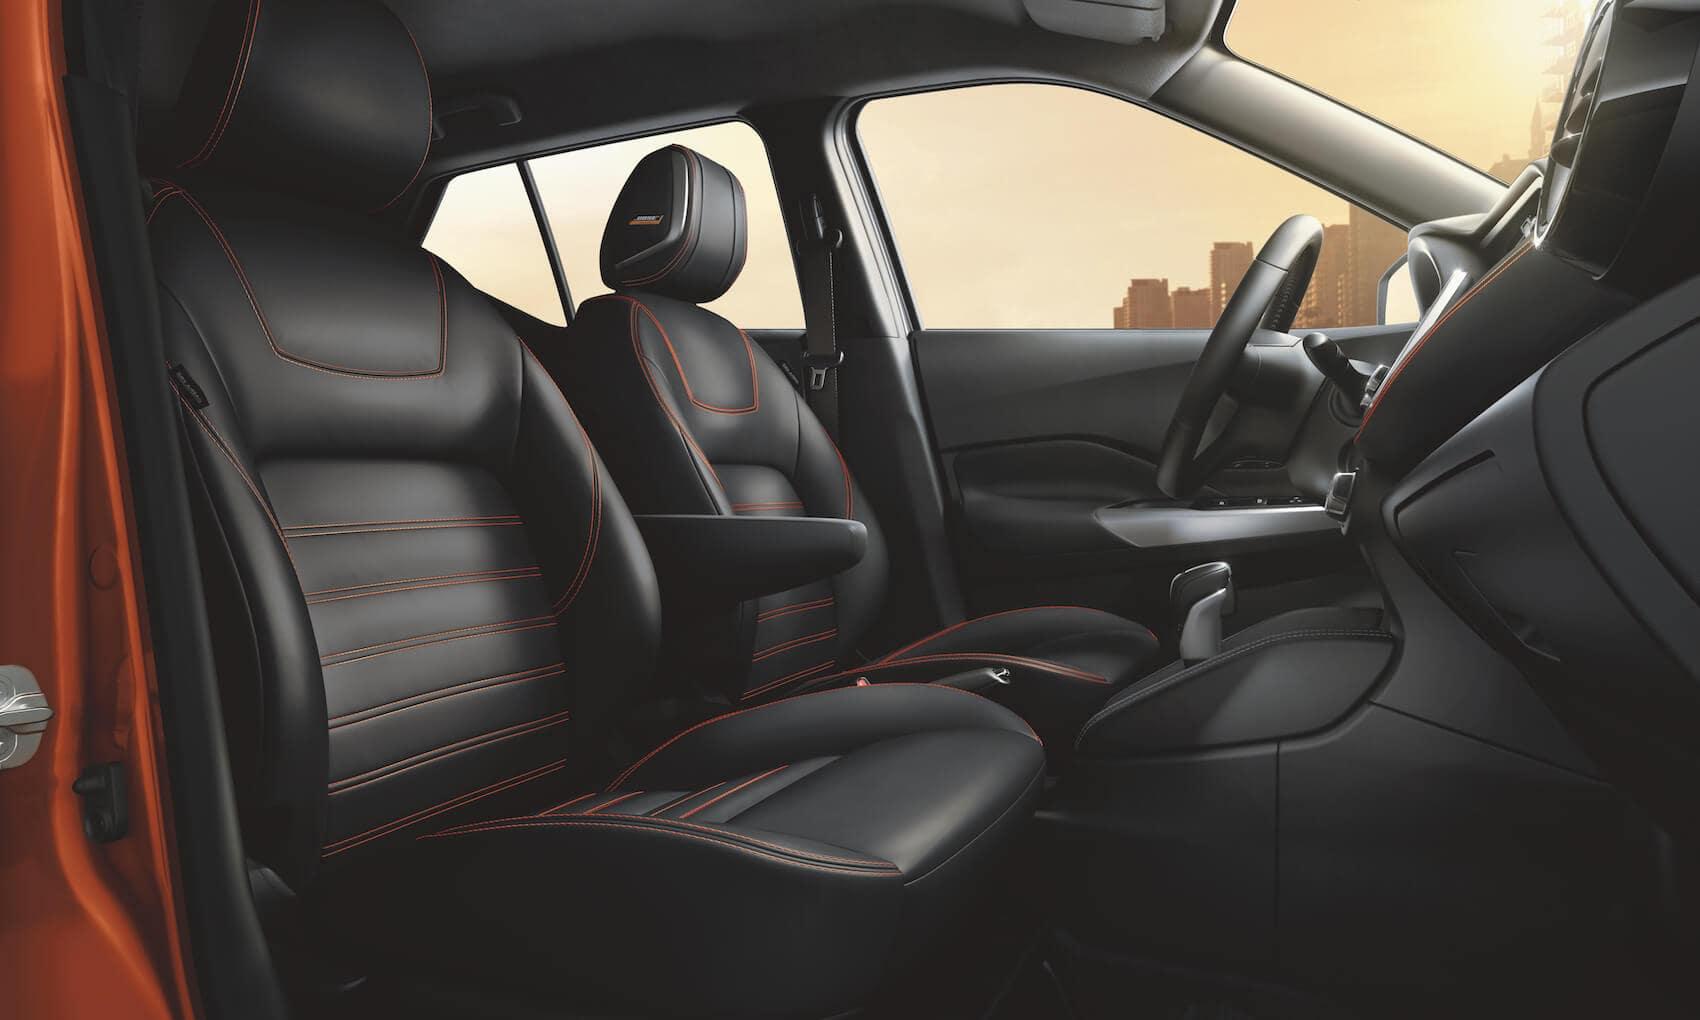 2020 Nissan Kicks interior New Castle, DE